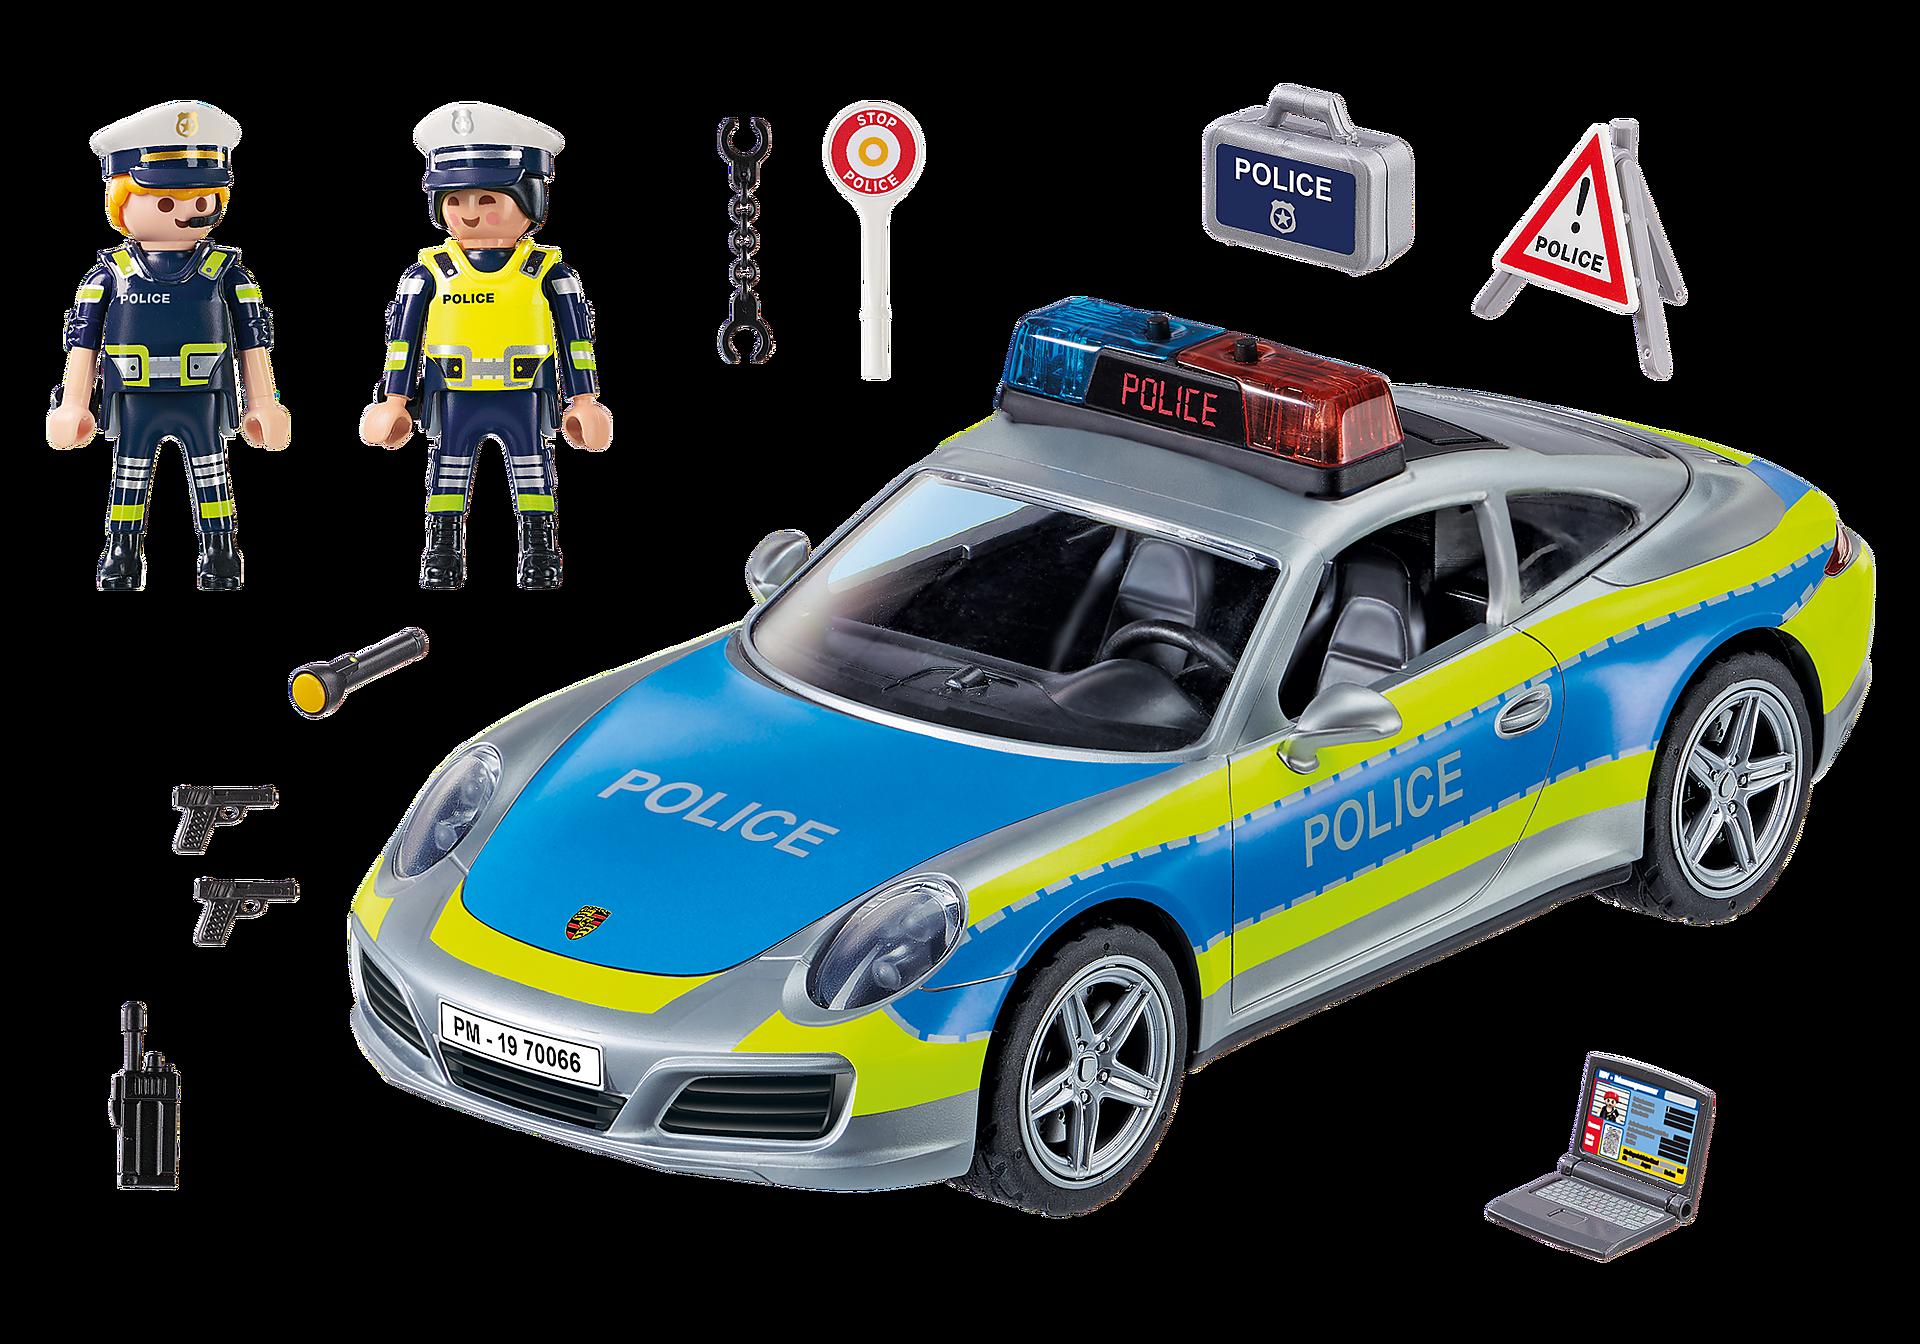 http://media.playmobil.com/i/playmobil/70066_product_box_back/Porsche 911 Carrera 4S Polis